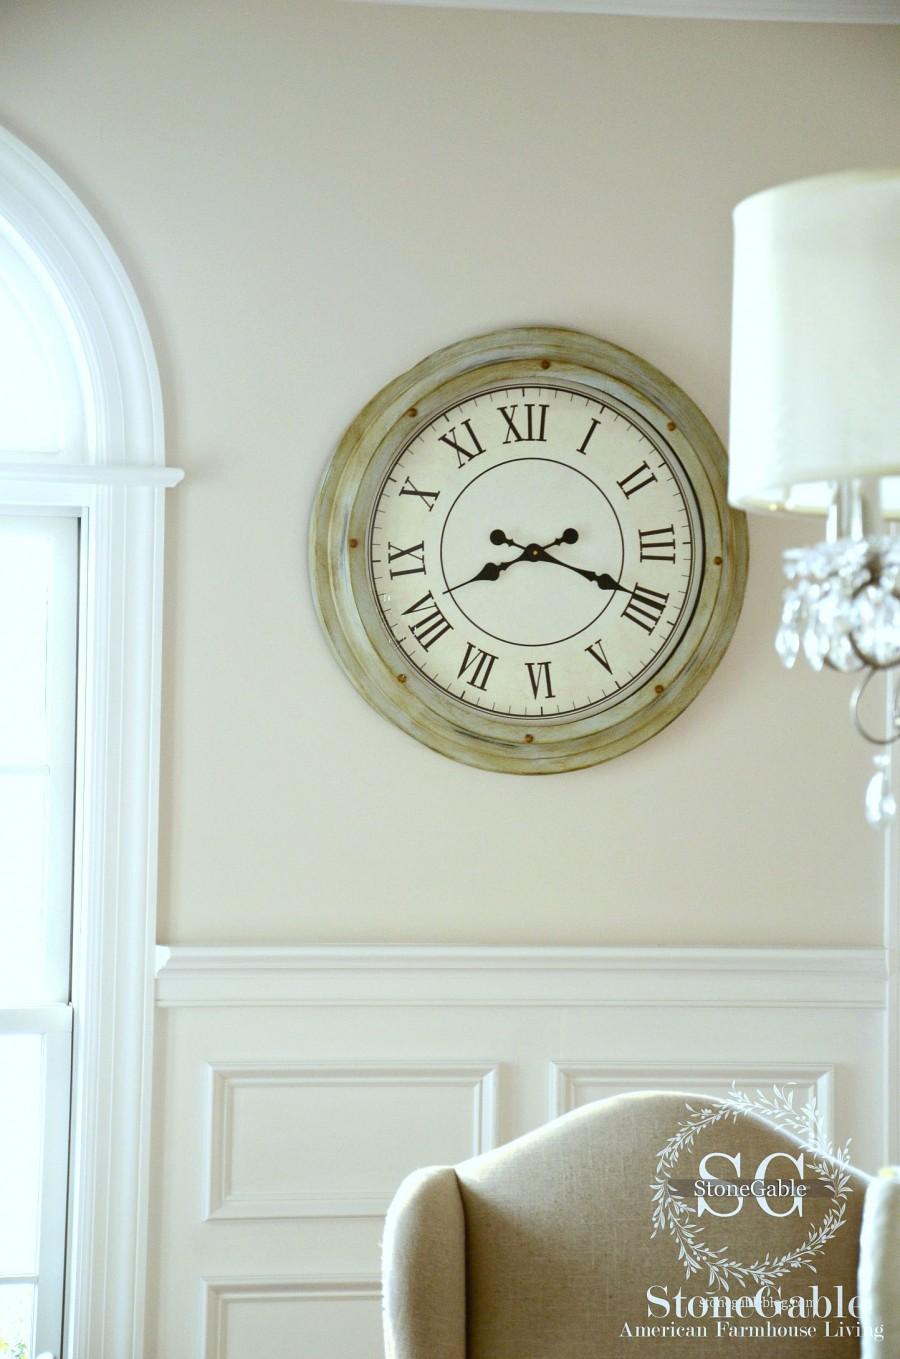 EVOLUTION OF A DINING ROOM-wall clock-stonegableblog.com